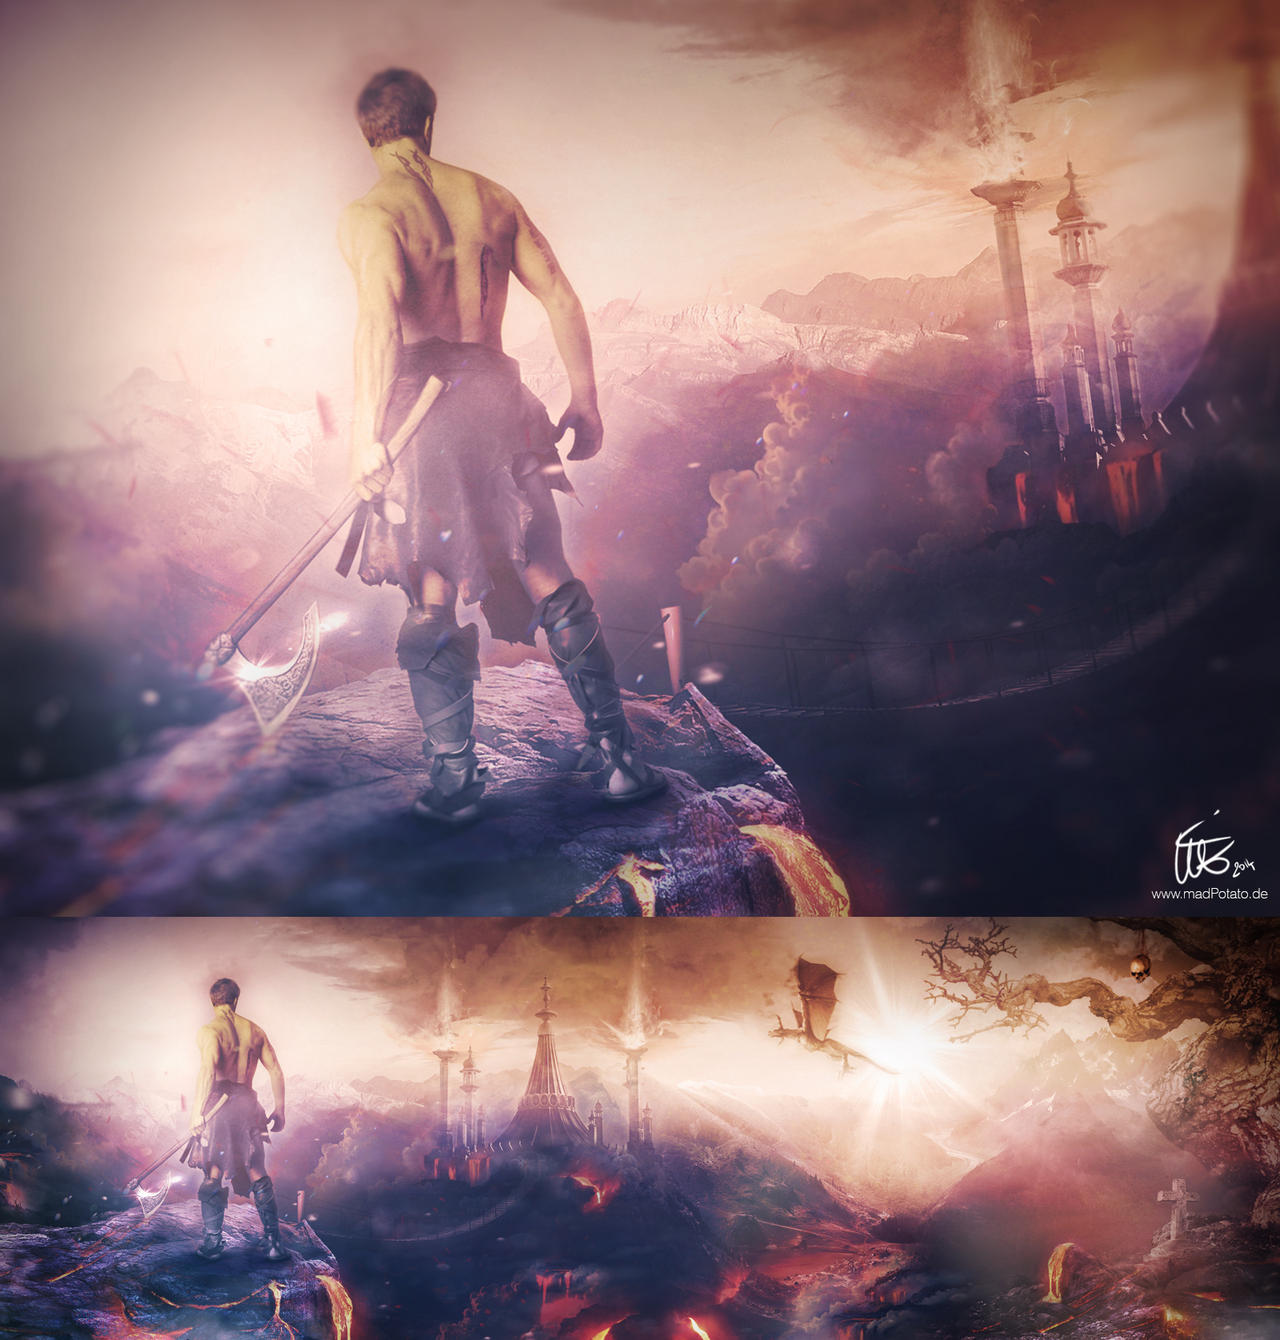 Fantasy 01 by MadPotato